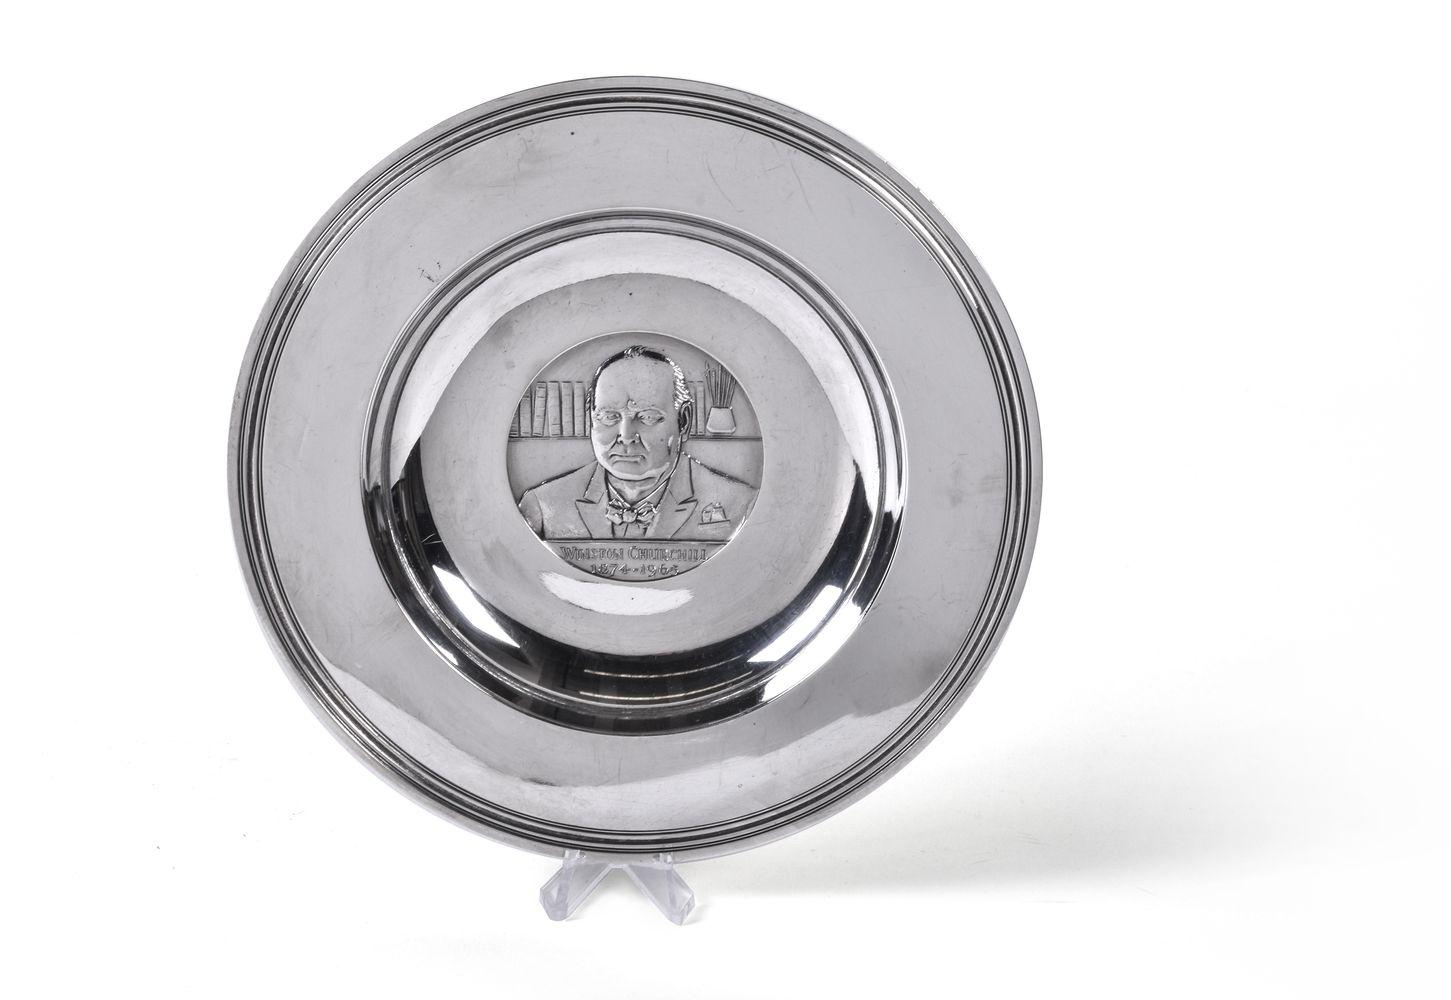 [Winston Churchill interest] A silver commemorative dish by C. J. Vander Ltd - Image 2 of 4